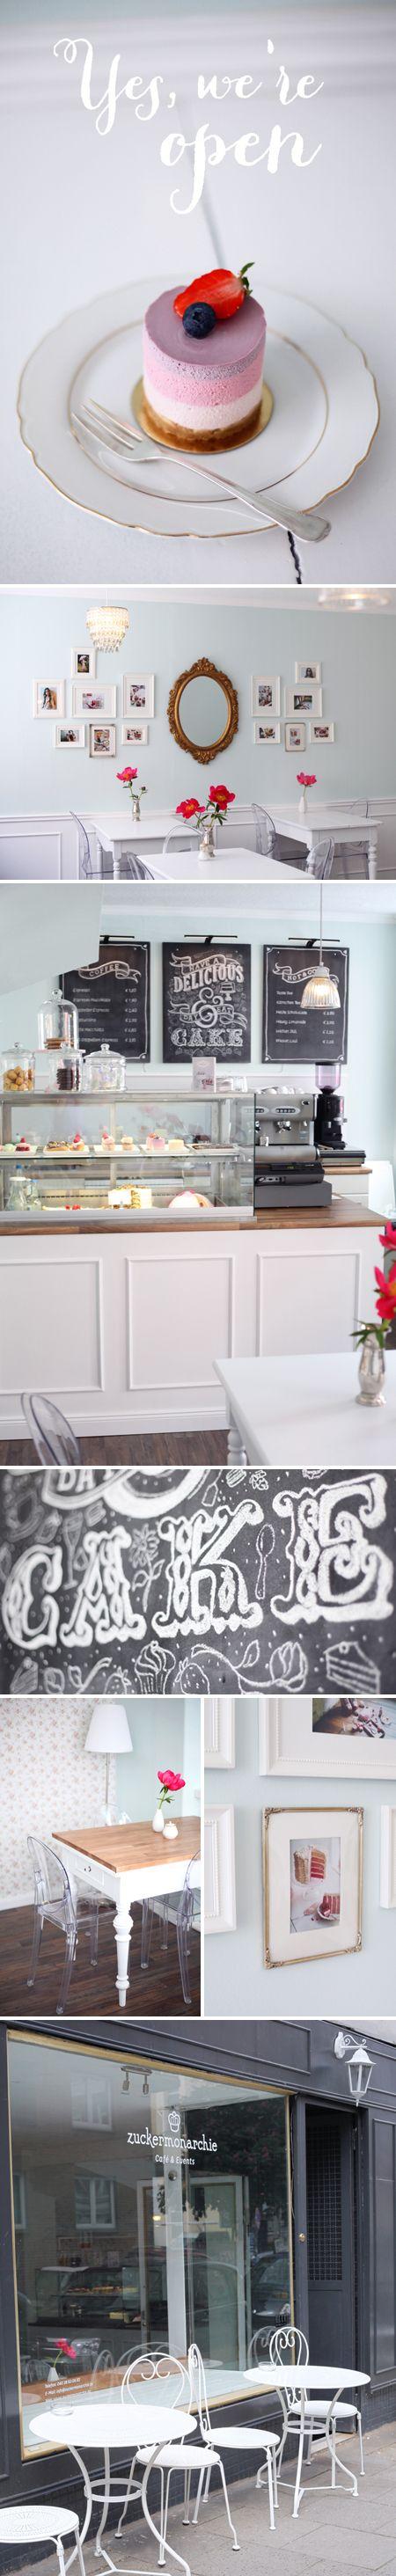 Our Café in Hamburg (Taubenstraße 15 / St. Pauli)